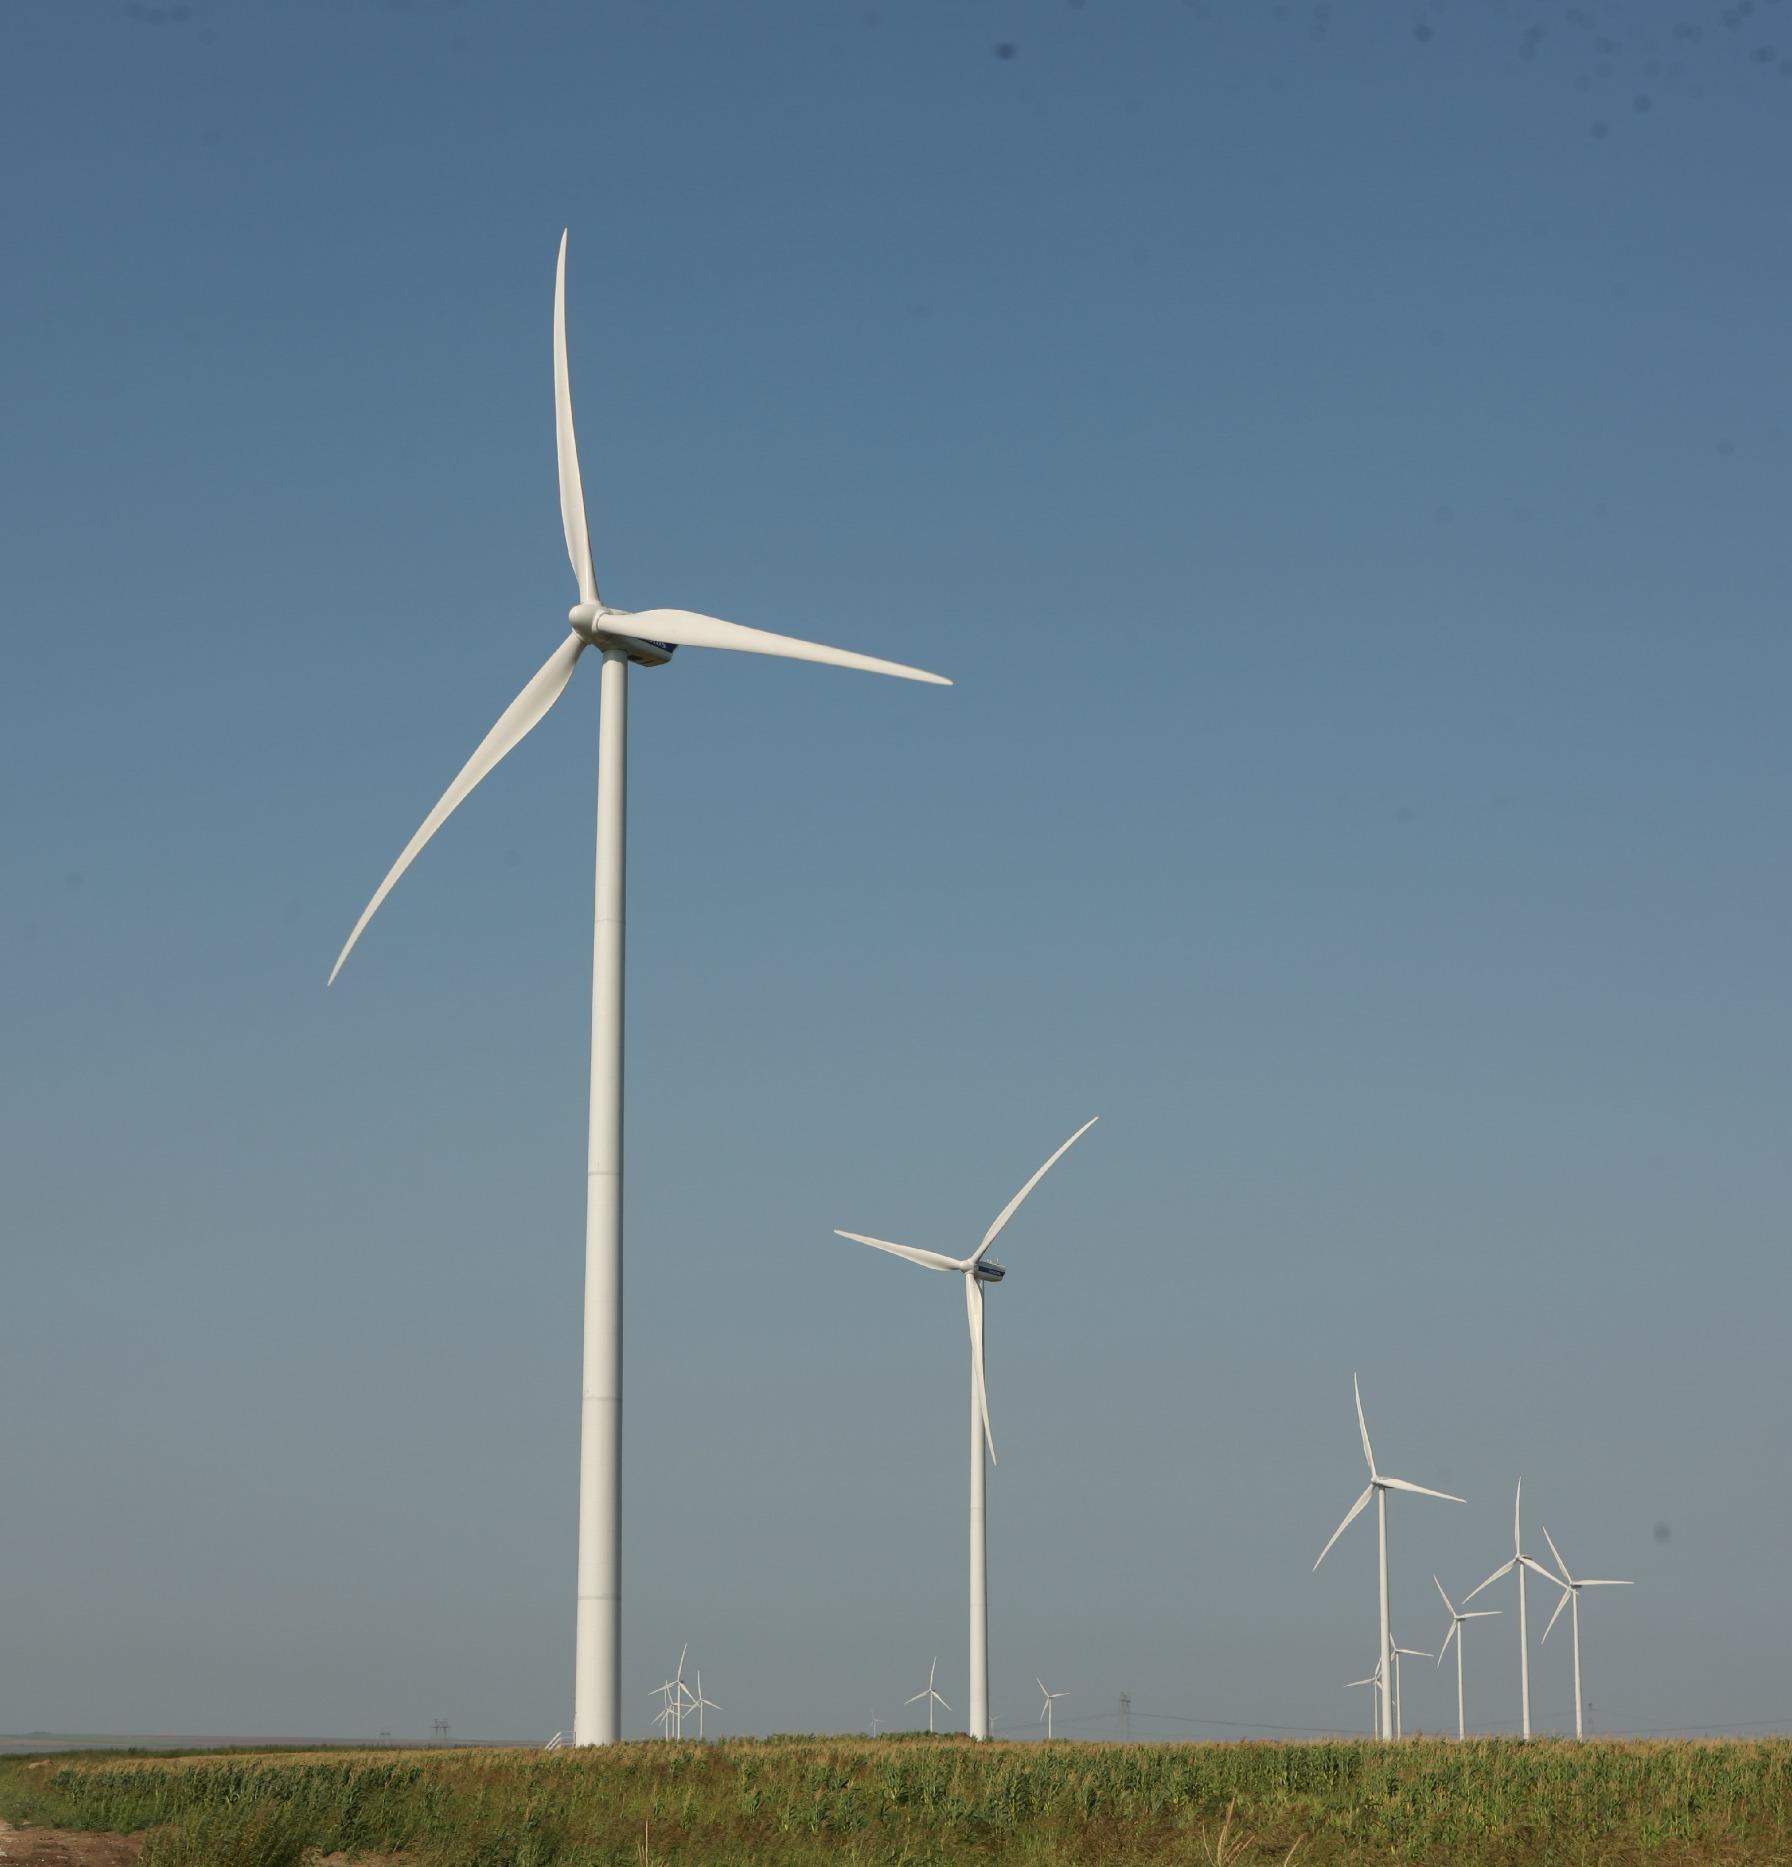 Romania's antitrust body clears Transeastern Power takeover of OMV Petrom Wind Power